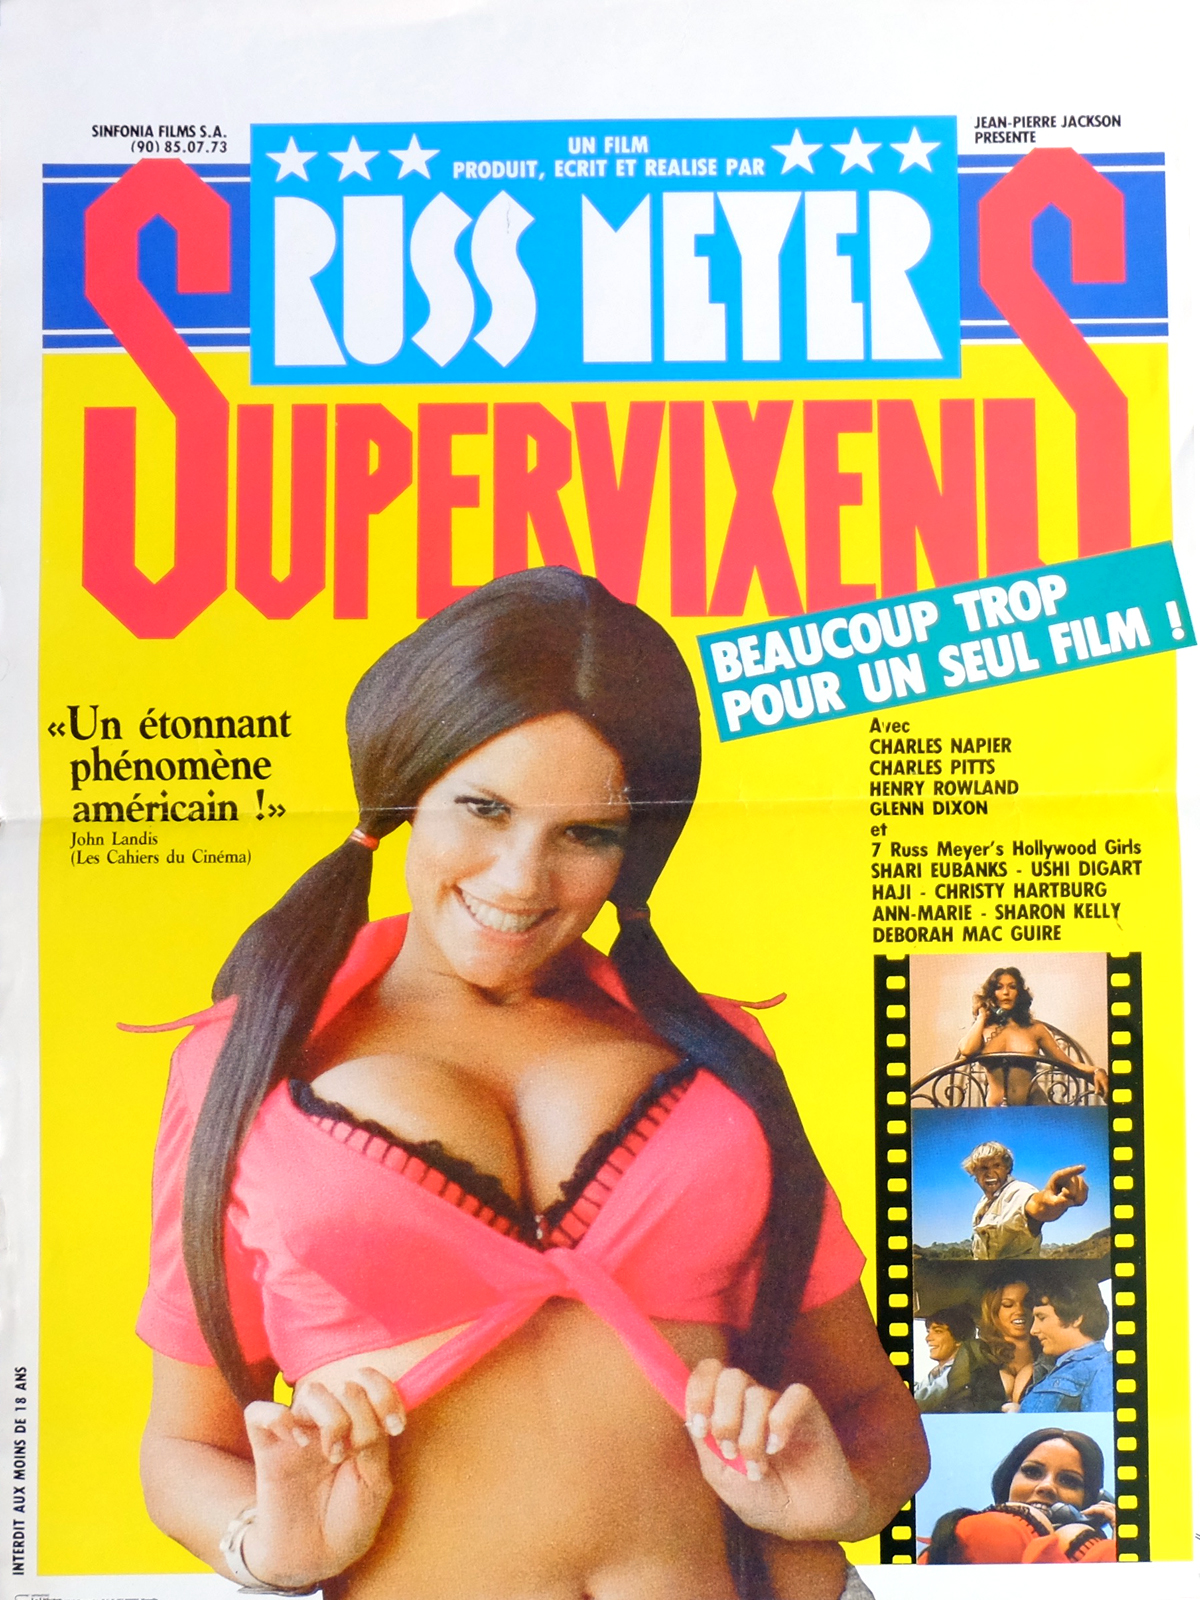 russ meyer imdbruss meyer tarantino, russ meyer deutsch, russ meyer collection, russ meyer imdb, russ meyer wiki, russ meyer filmography, russ meyer films list, russ meyer youtube